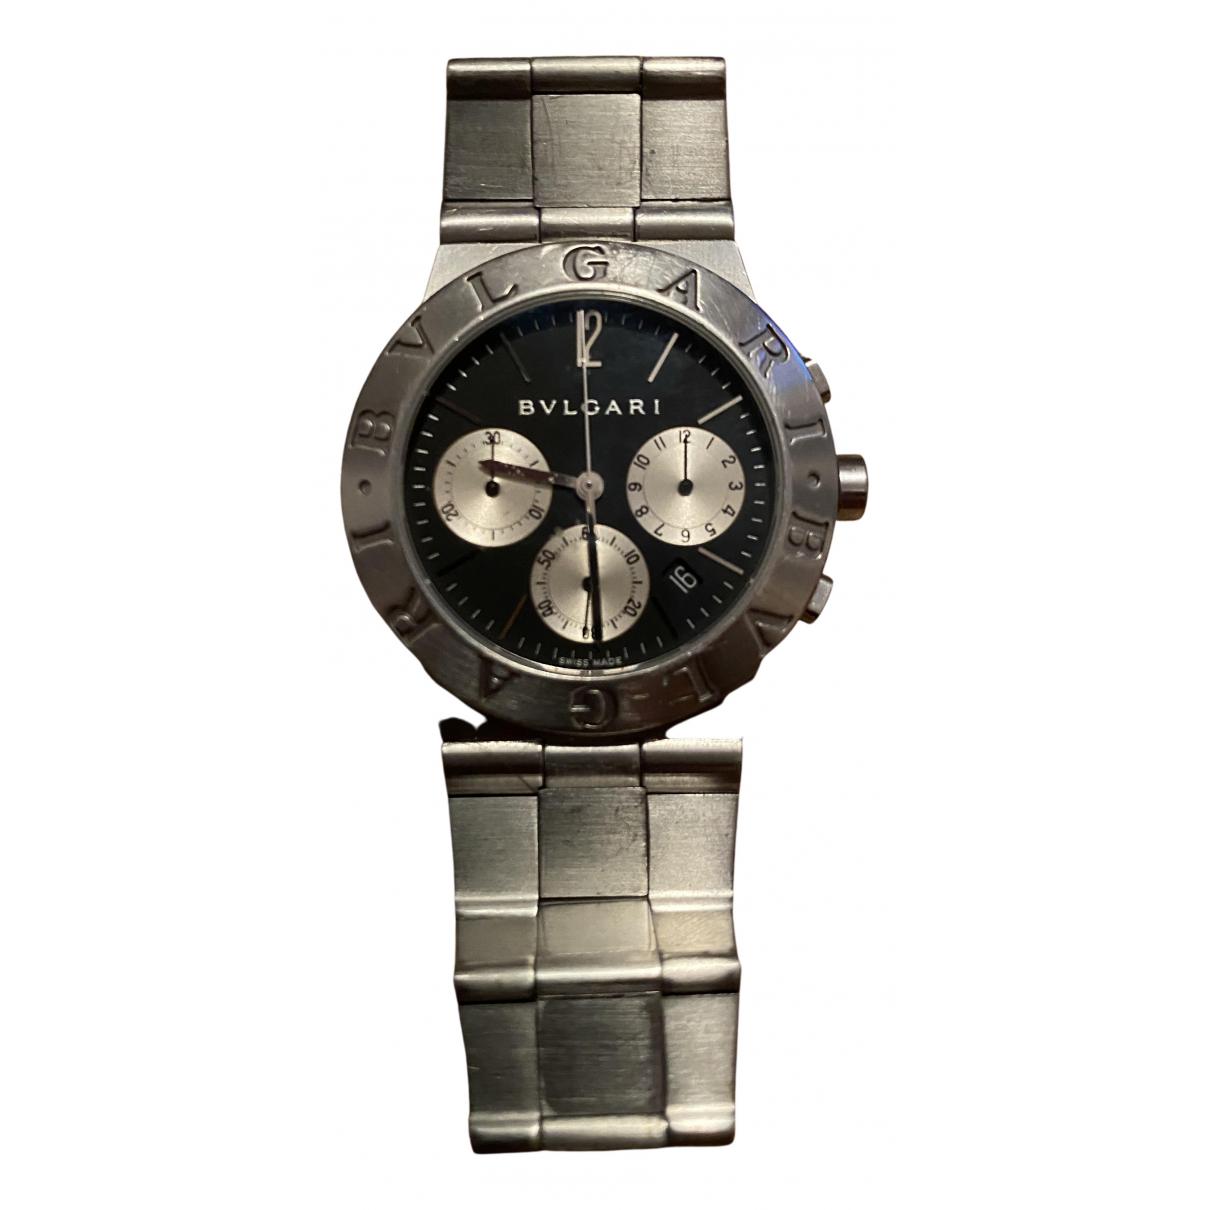 Bvlgari Diagono Uhr in  Silber Stahl